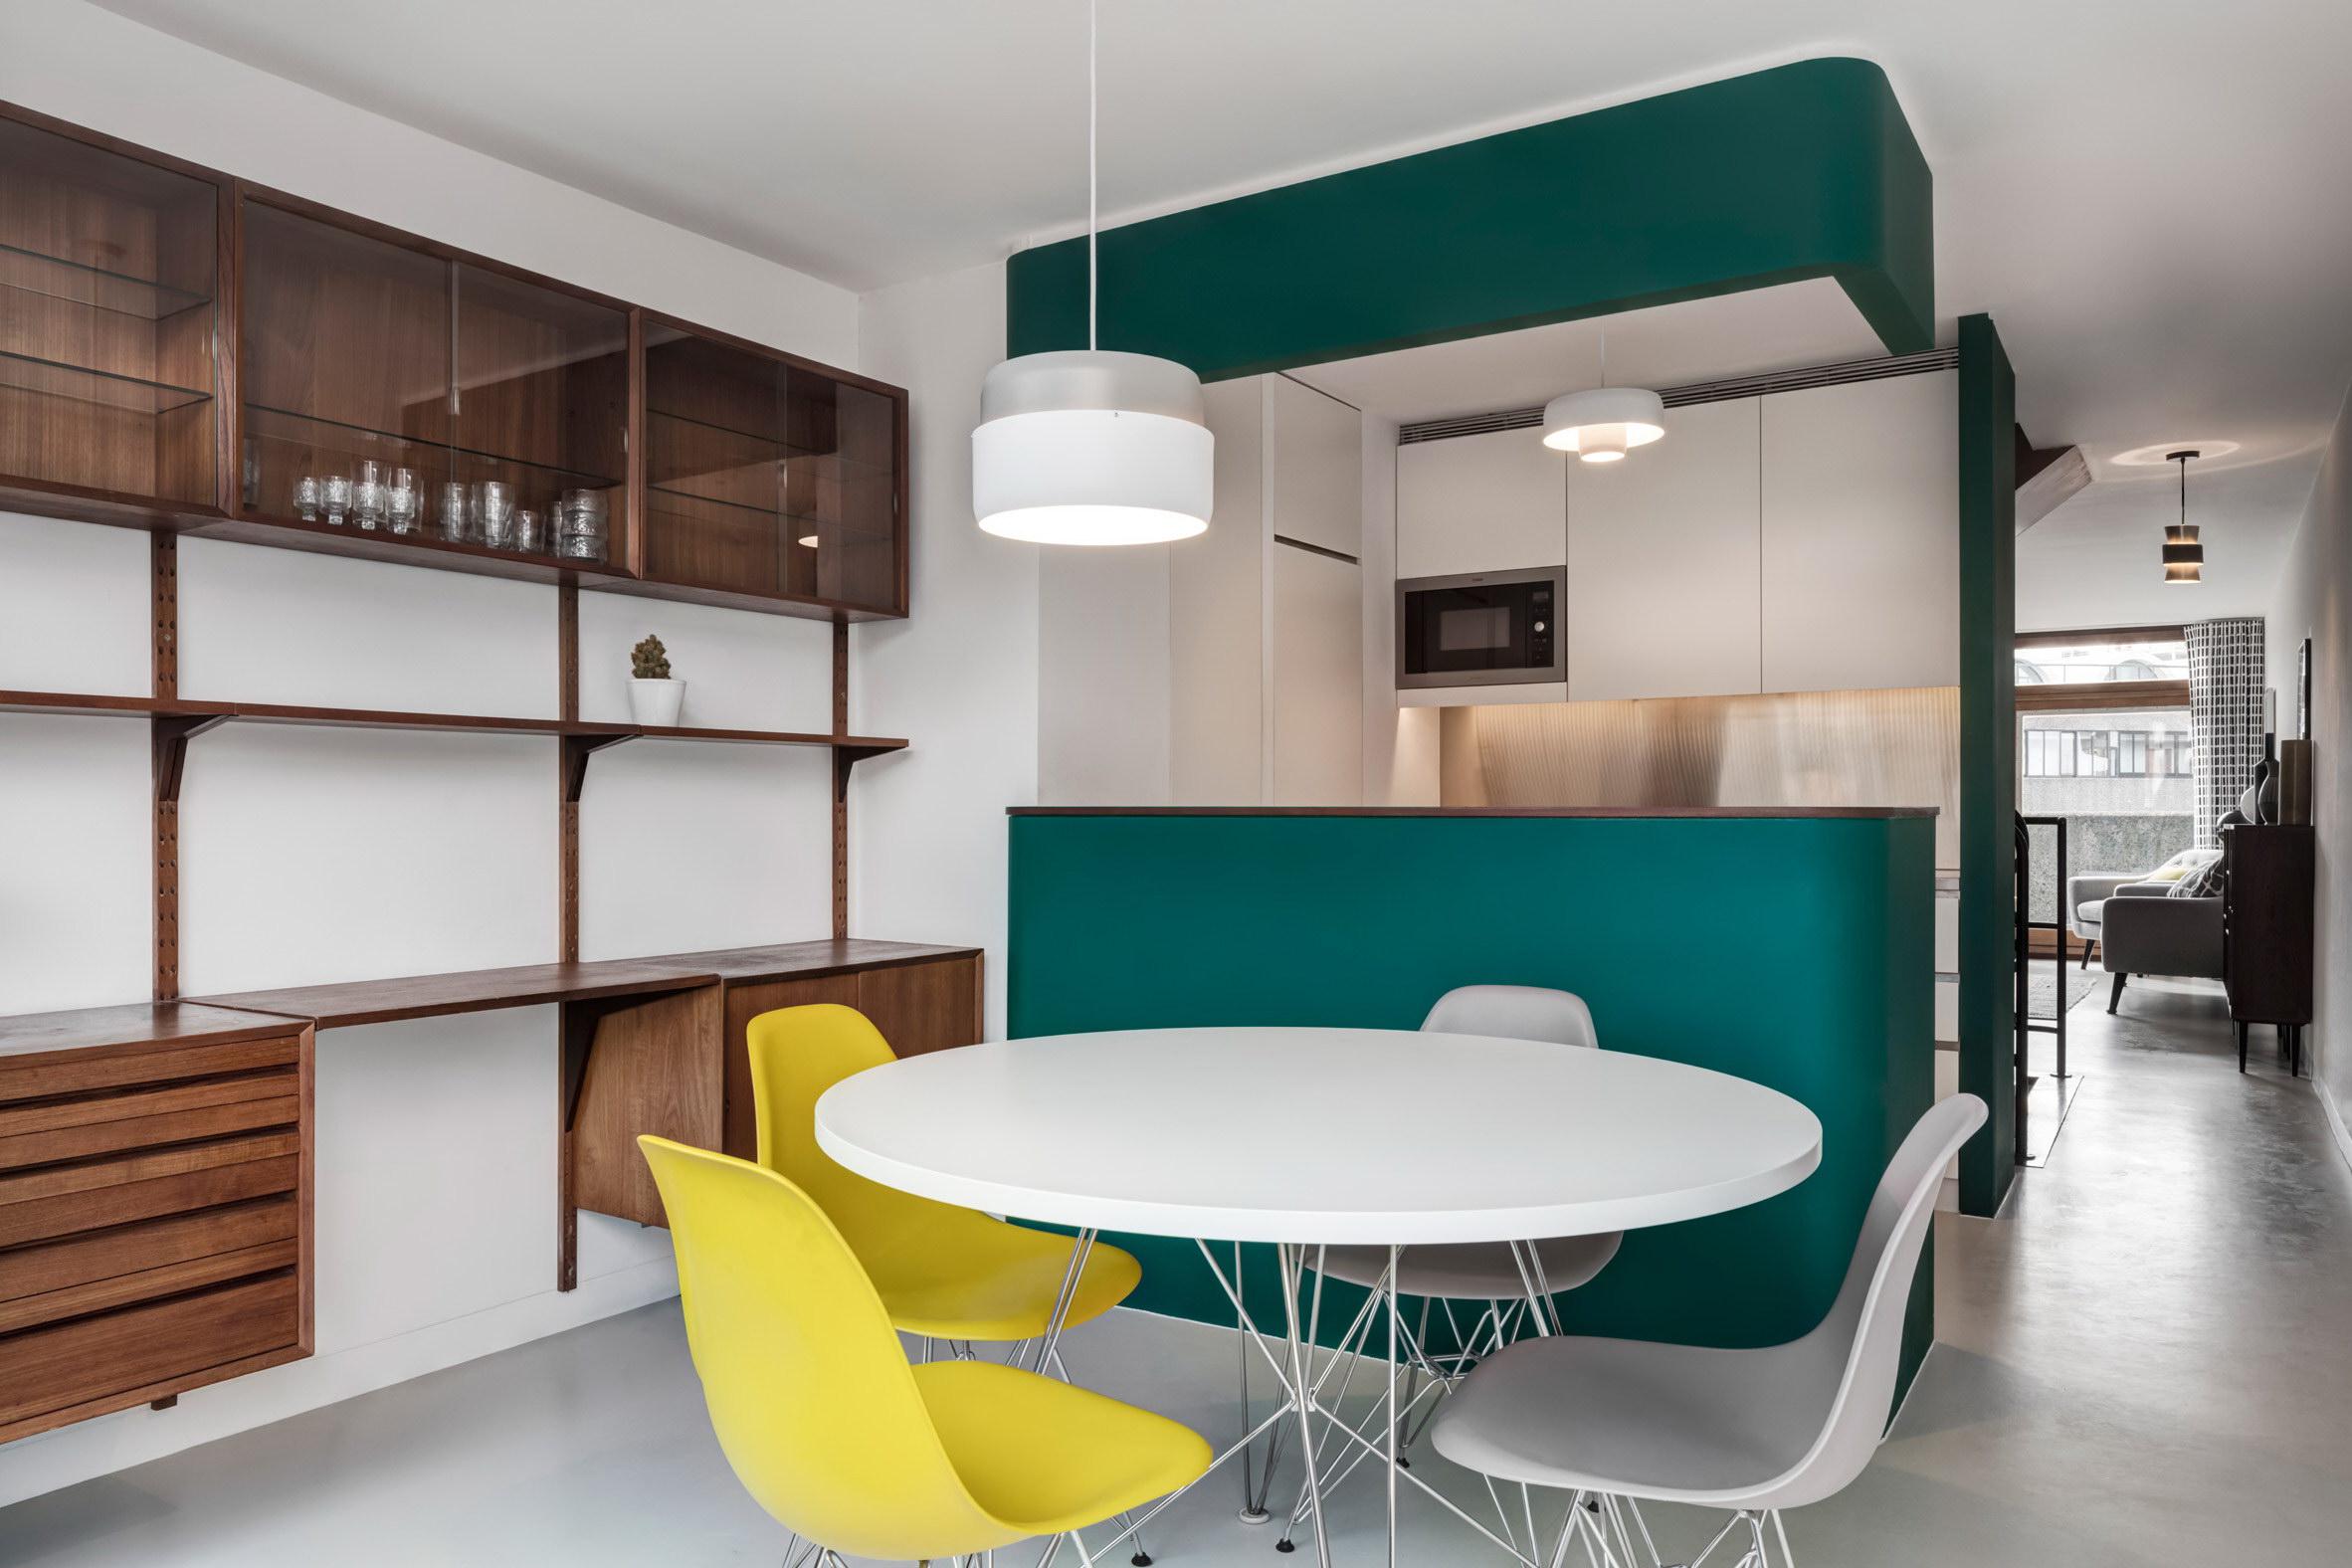 Ben Johnson House by Emulsion Architects